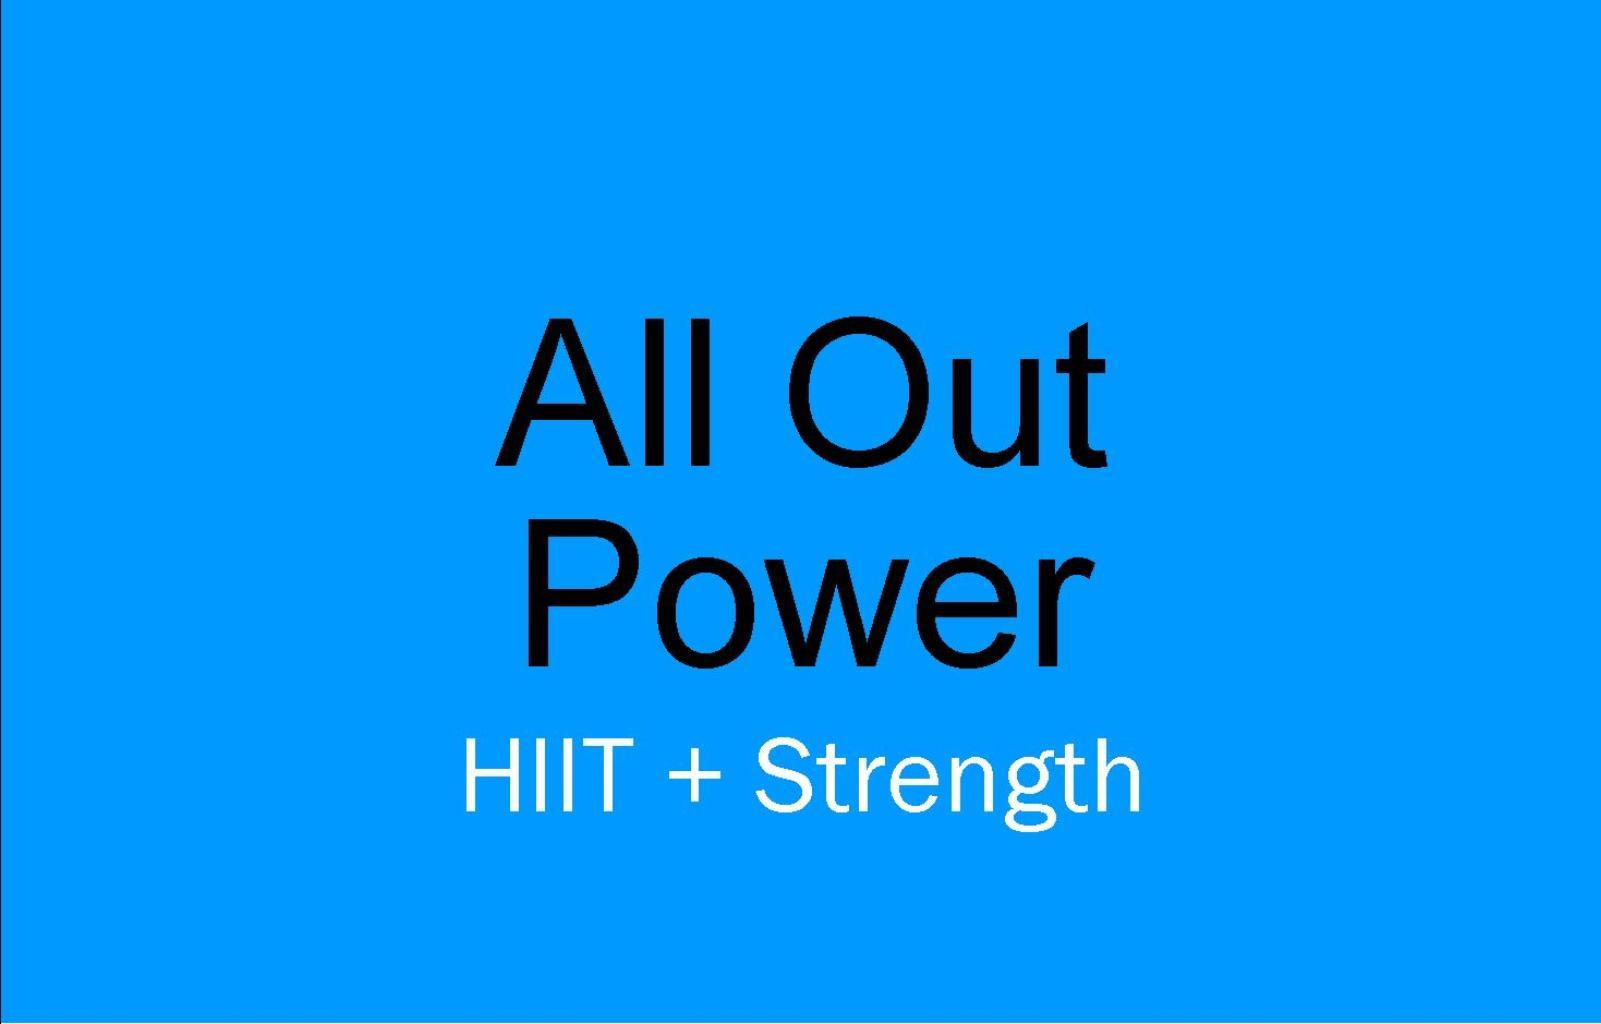 https://f.hubspotusercontent20.net/hub/2470171/hubfs/blog/HIIT%20All%20Out%20Power.jpg?width=1609&quality=high Feature Image